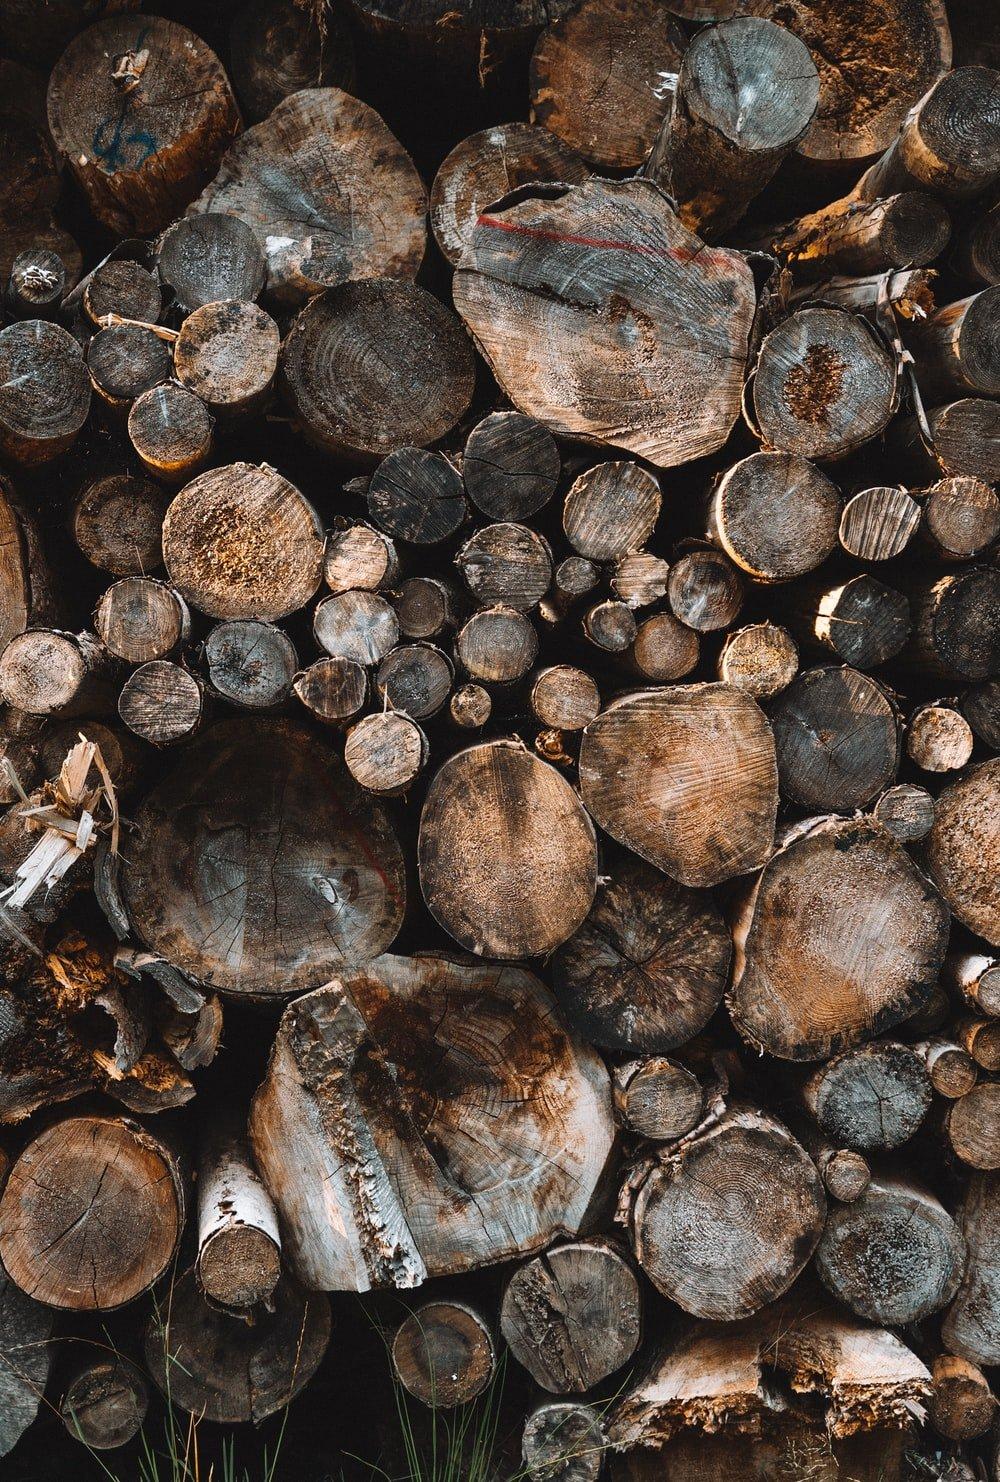 900 Wood Background Images Download HD Backgrounds on Unsplash 1000x1482